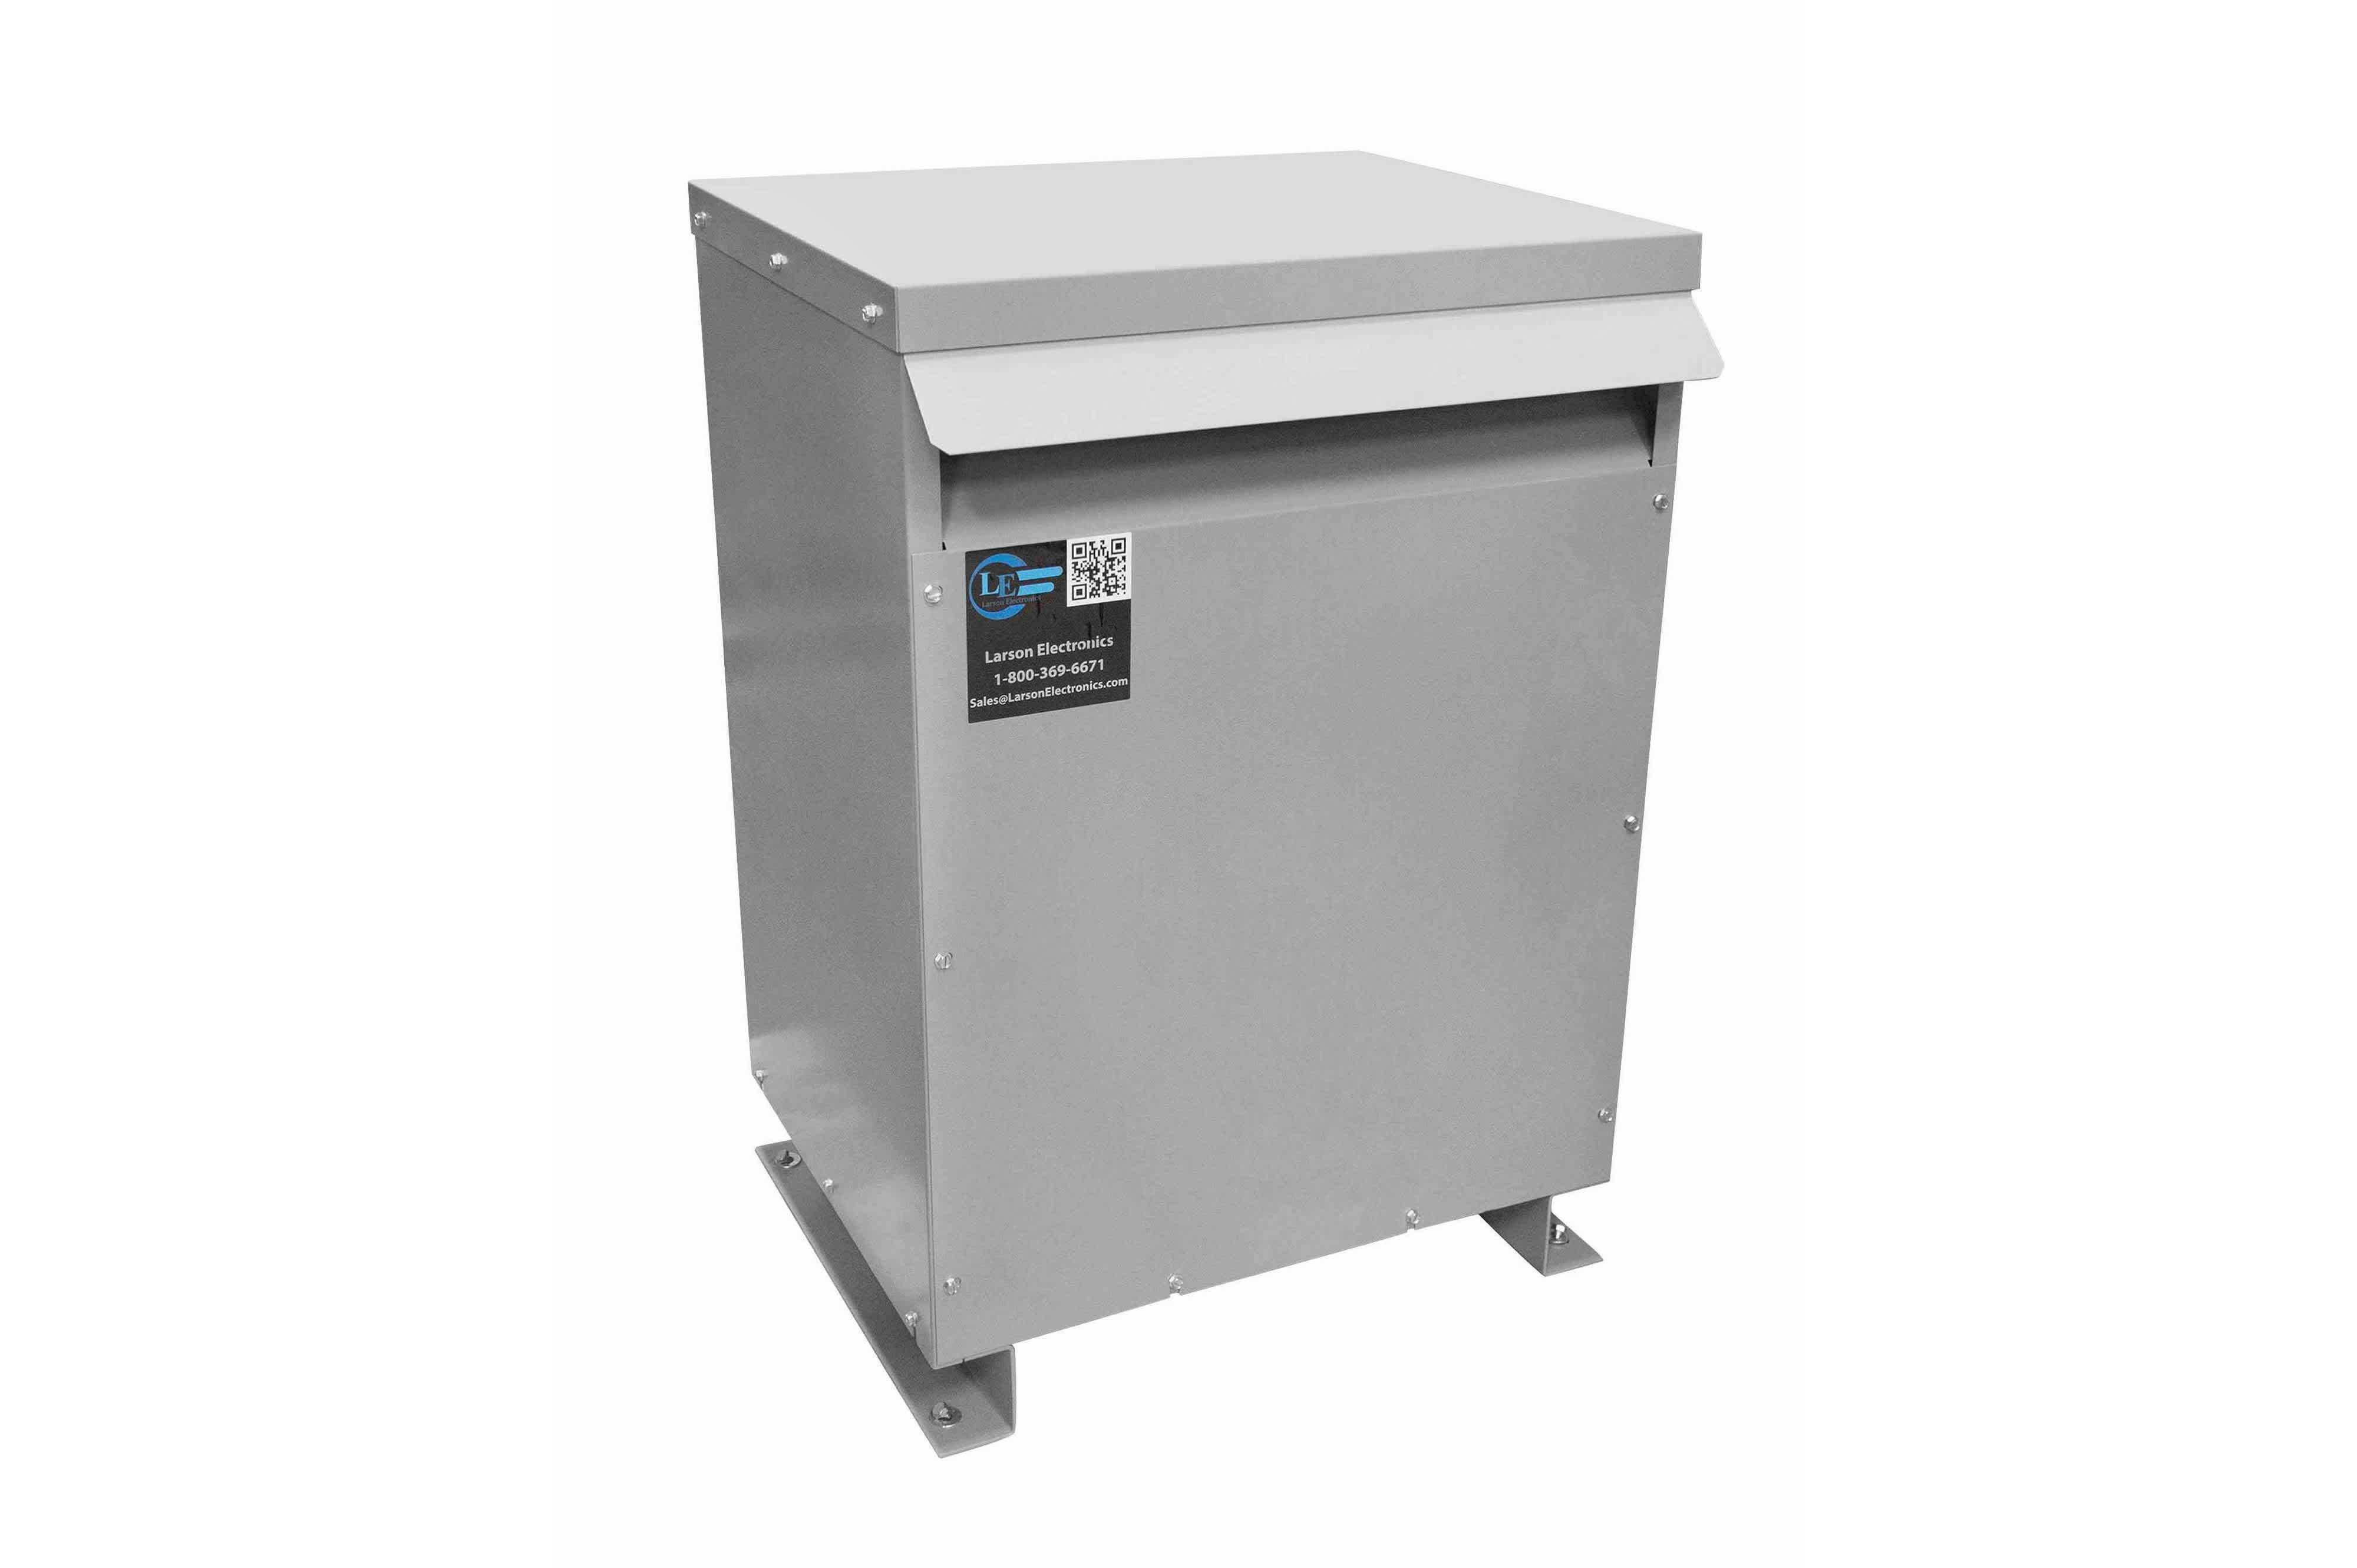 110 kVA 3PH Isolation Transformer, 460V Wye Primary, 575V Delta Secondary, N3R, Ventilated, 60 Hz